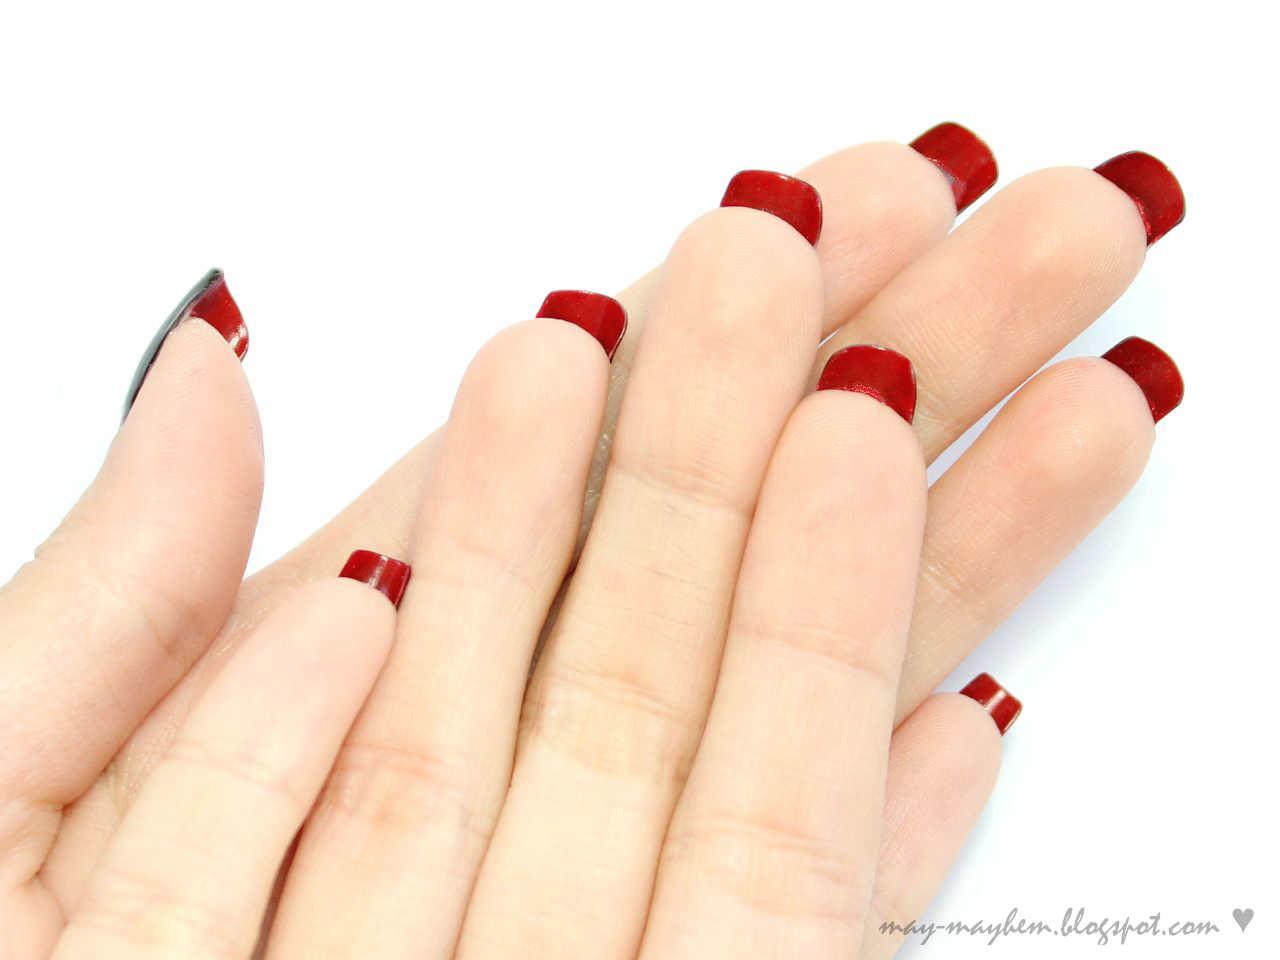 Mayhem: Christian Louboutin Inspired Nails